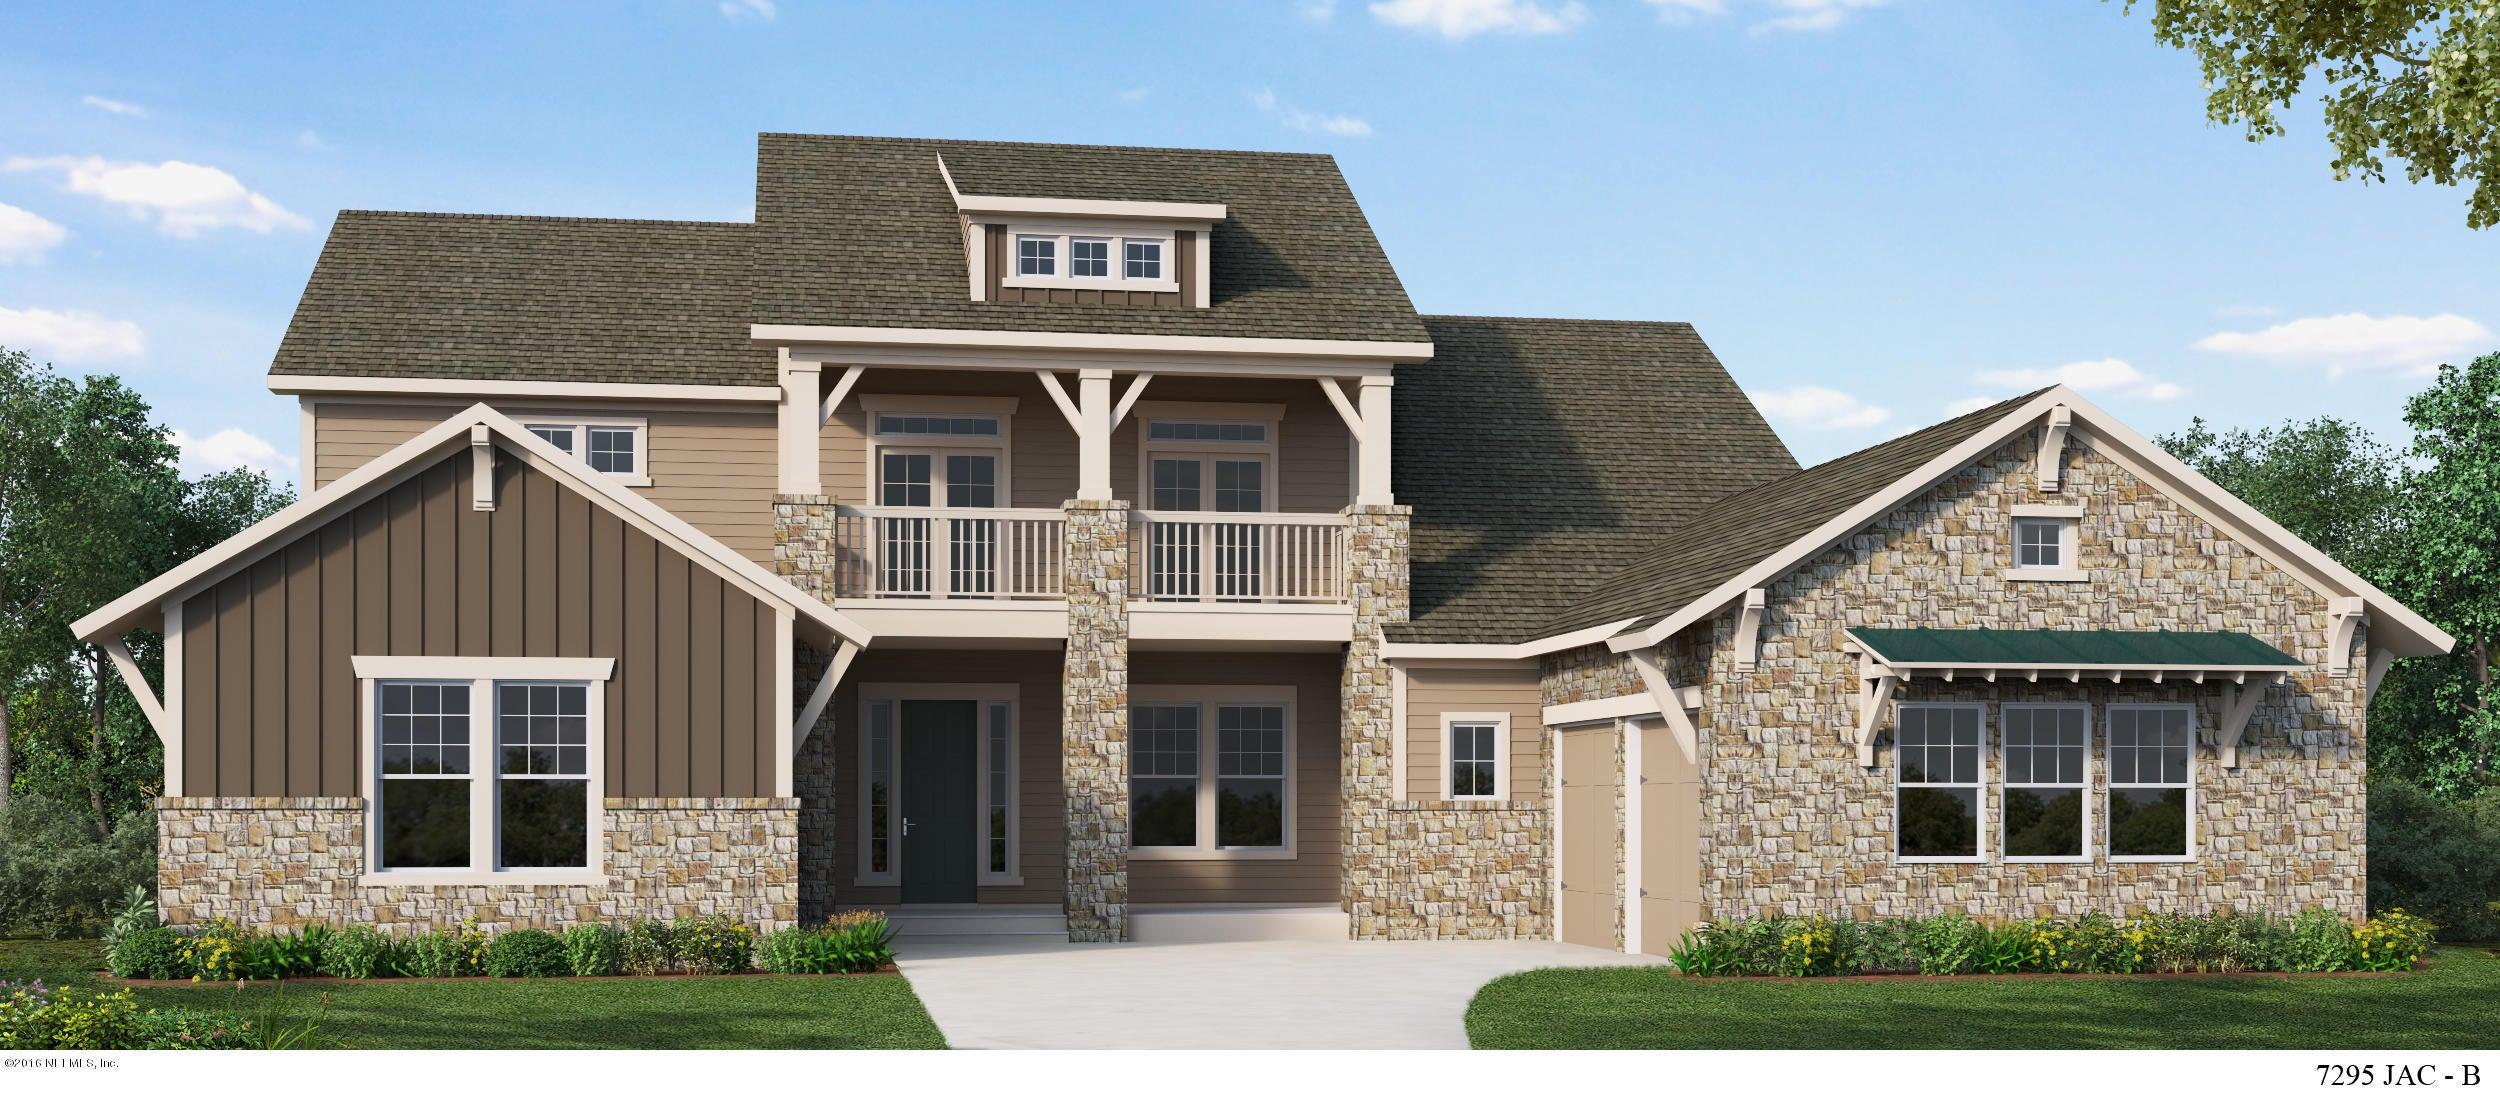 57 BENT,PONTE VEDRA,FLORIDA 32081,5 Bedrooms Bedrooms,5 BathroomsBathrooms,Residential - single family,BENT,845303